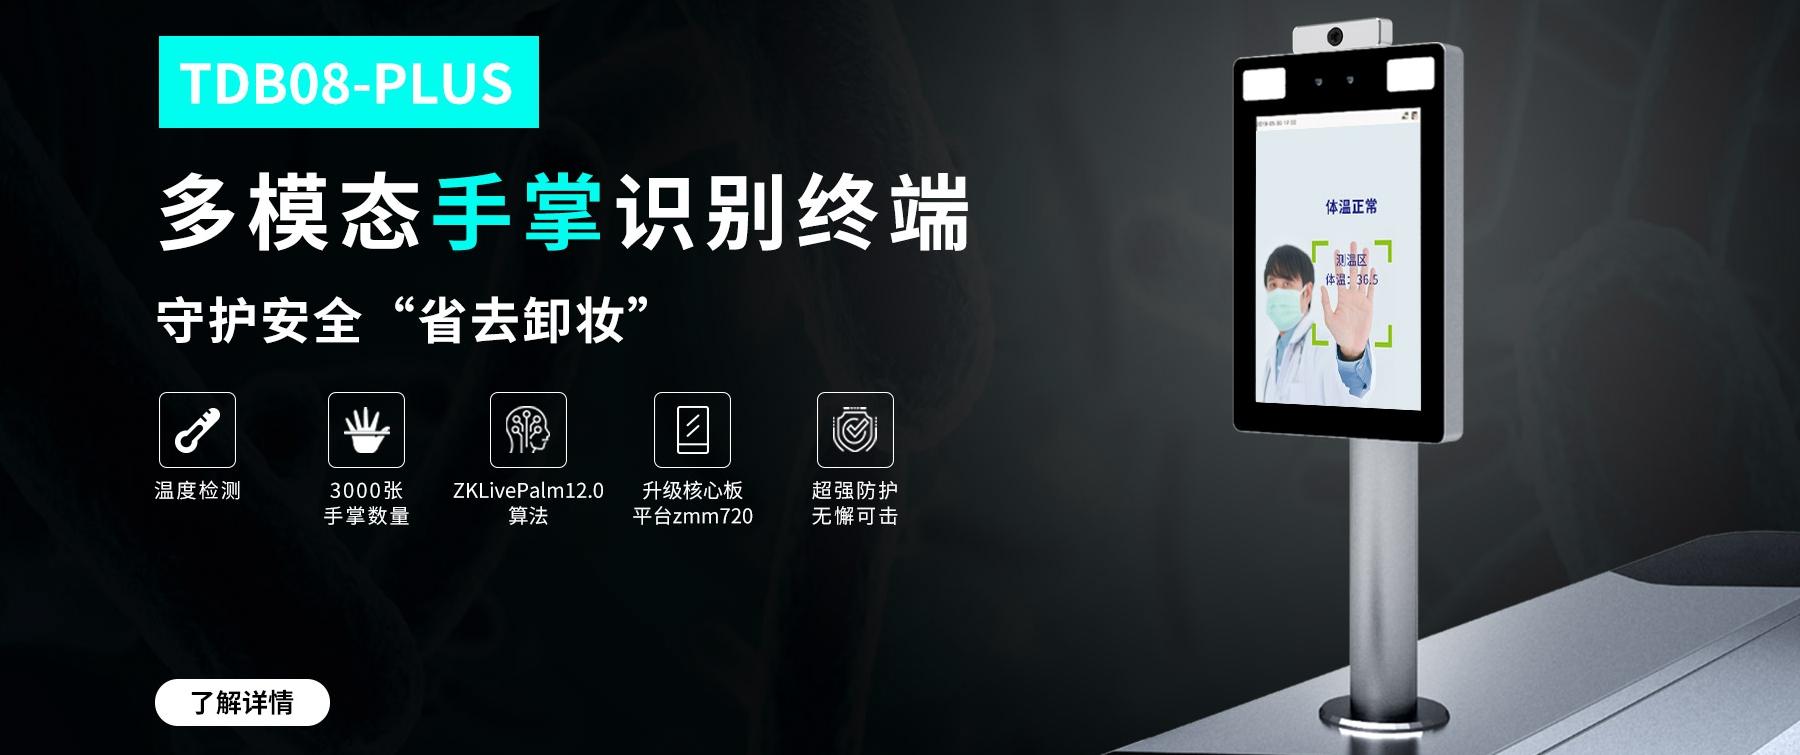 TDB08_上海直前智能科技有限公司